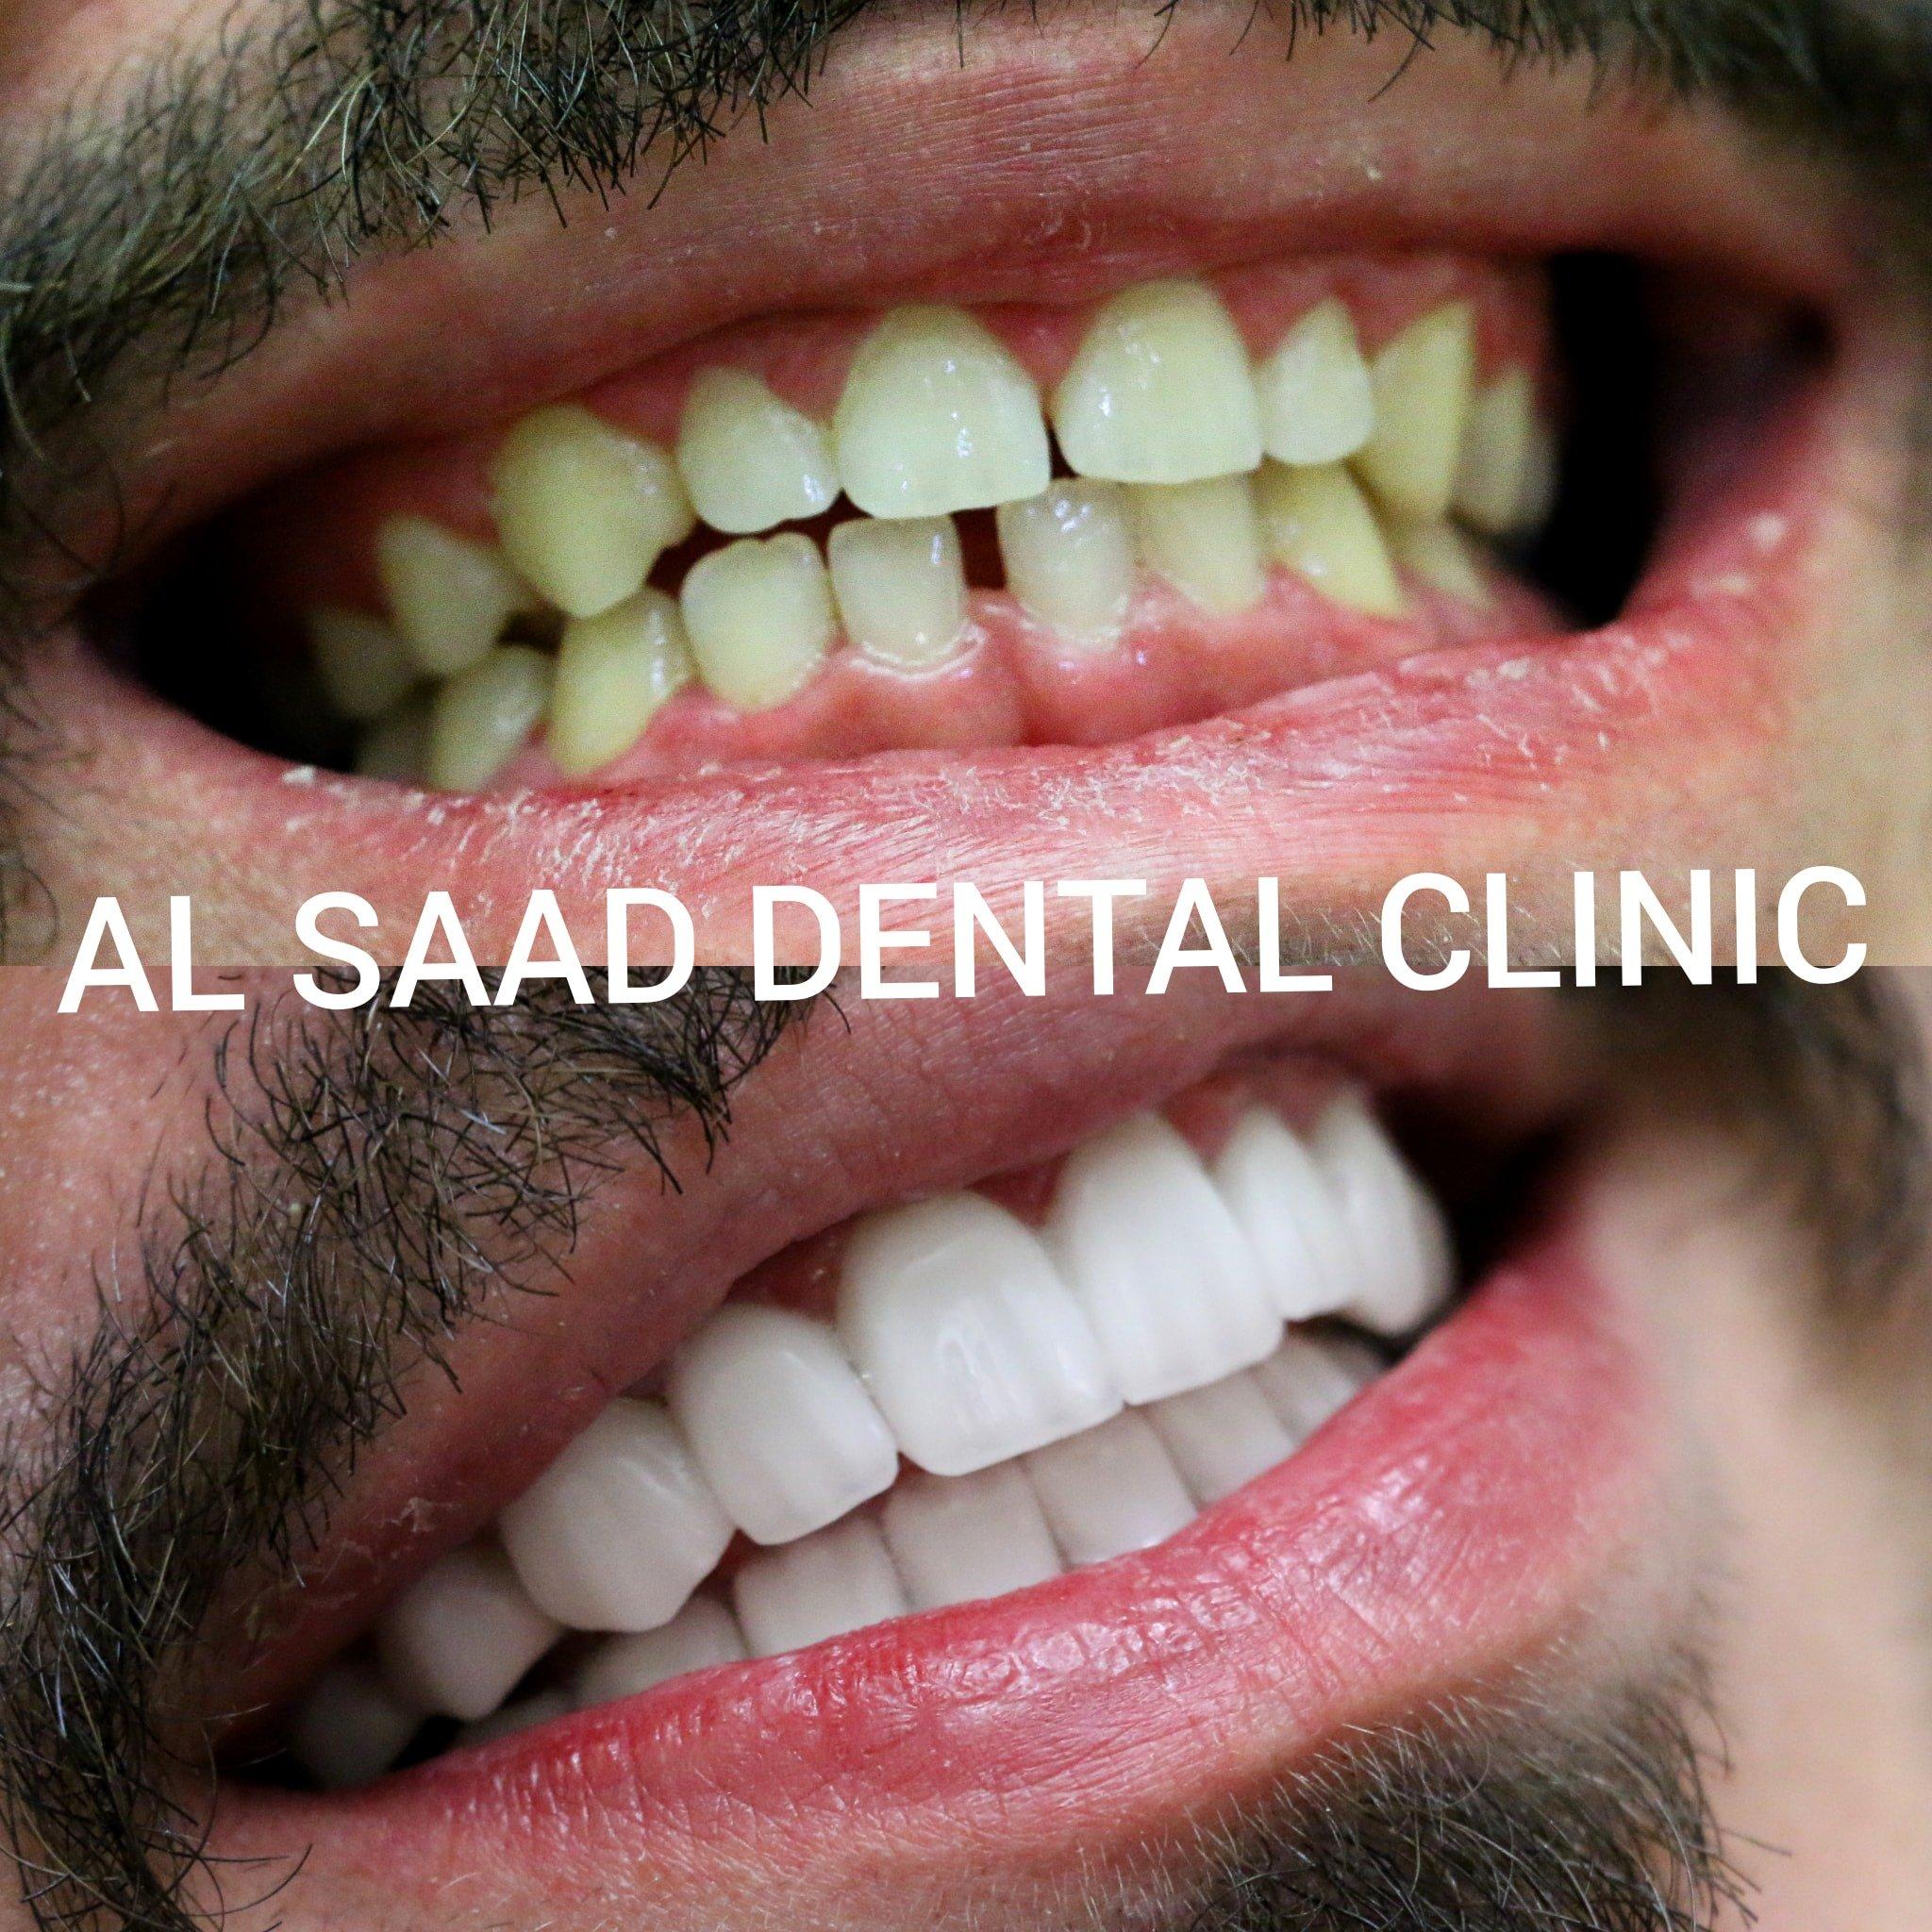 Al Saad Dental Clinic